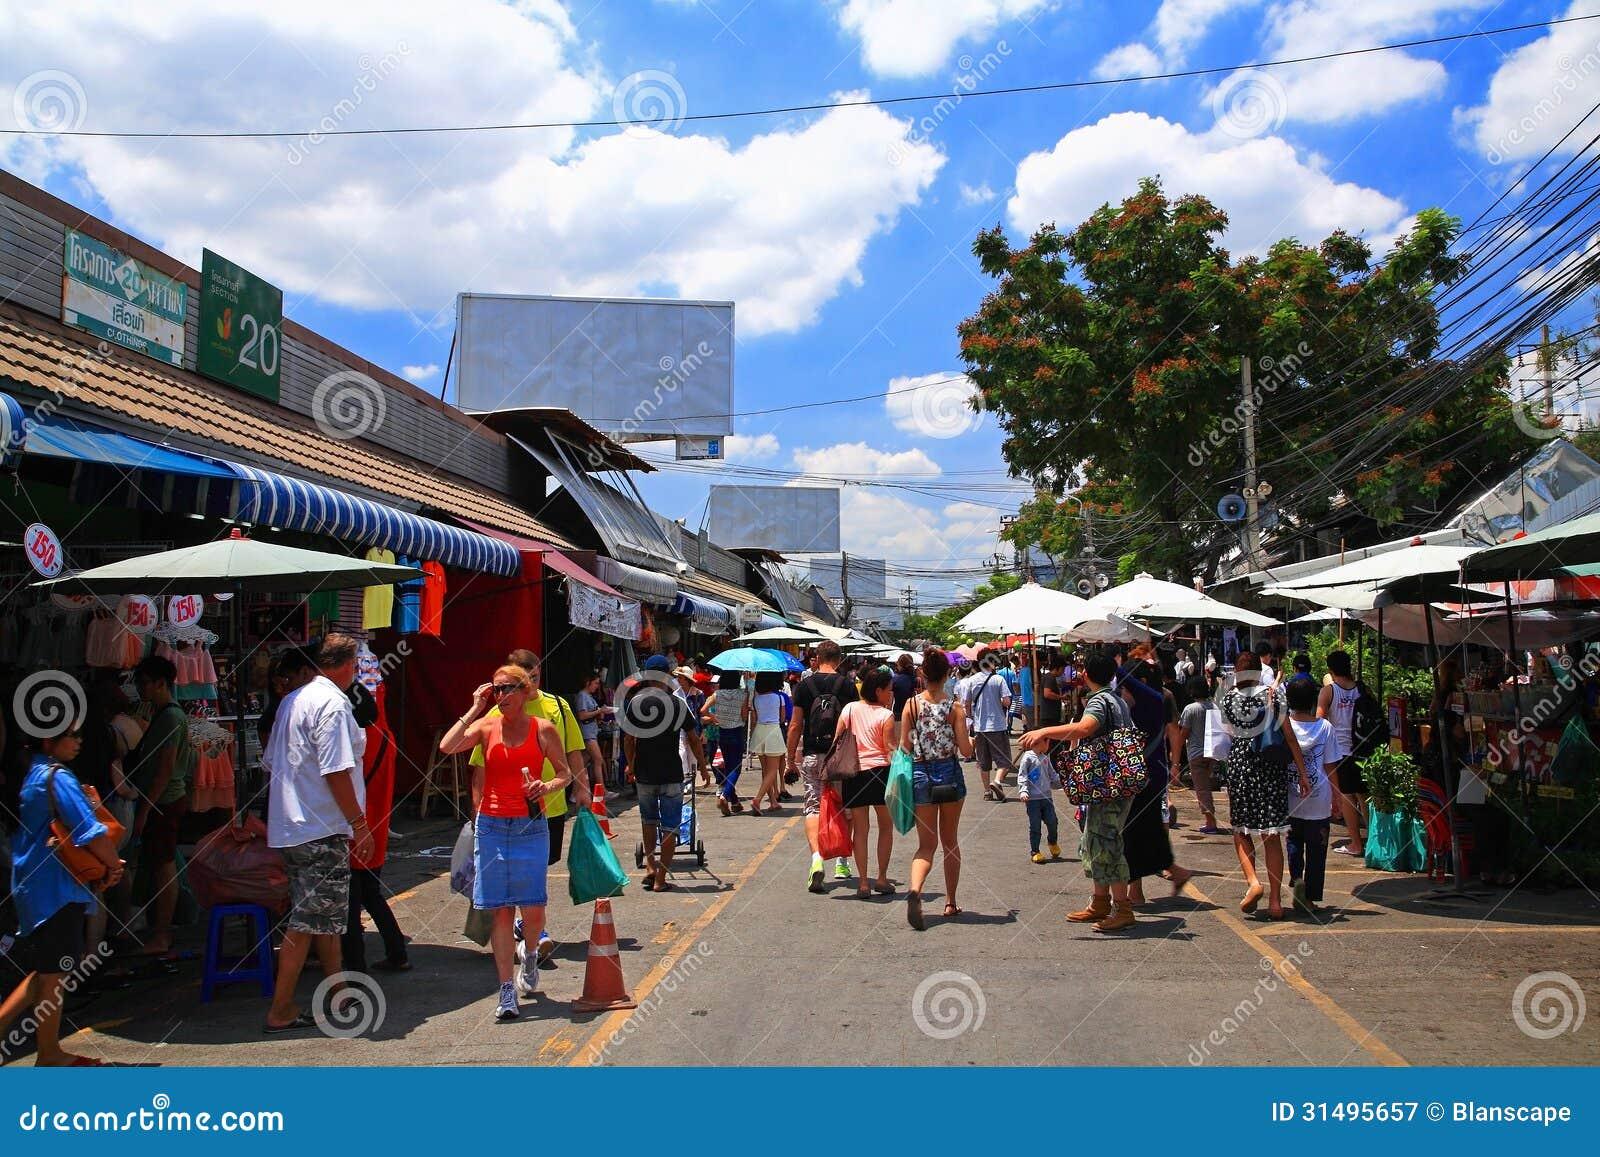 Tourists Visit Chatuchak Weekend Shopping Market In ...